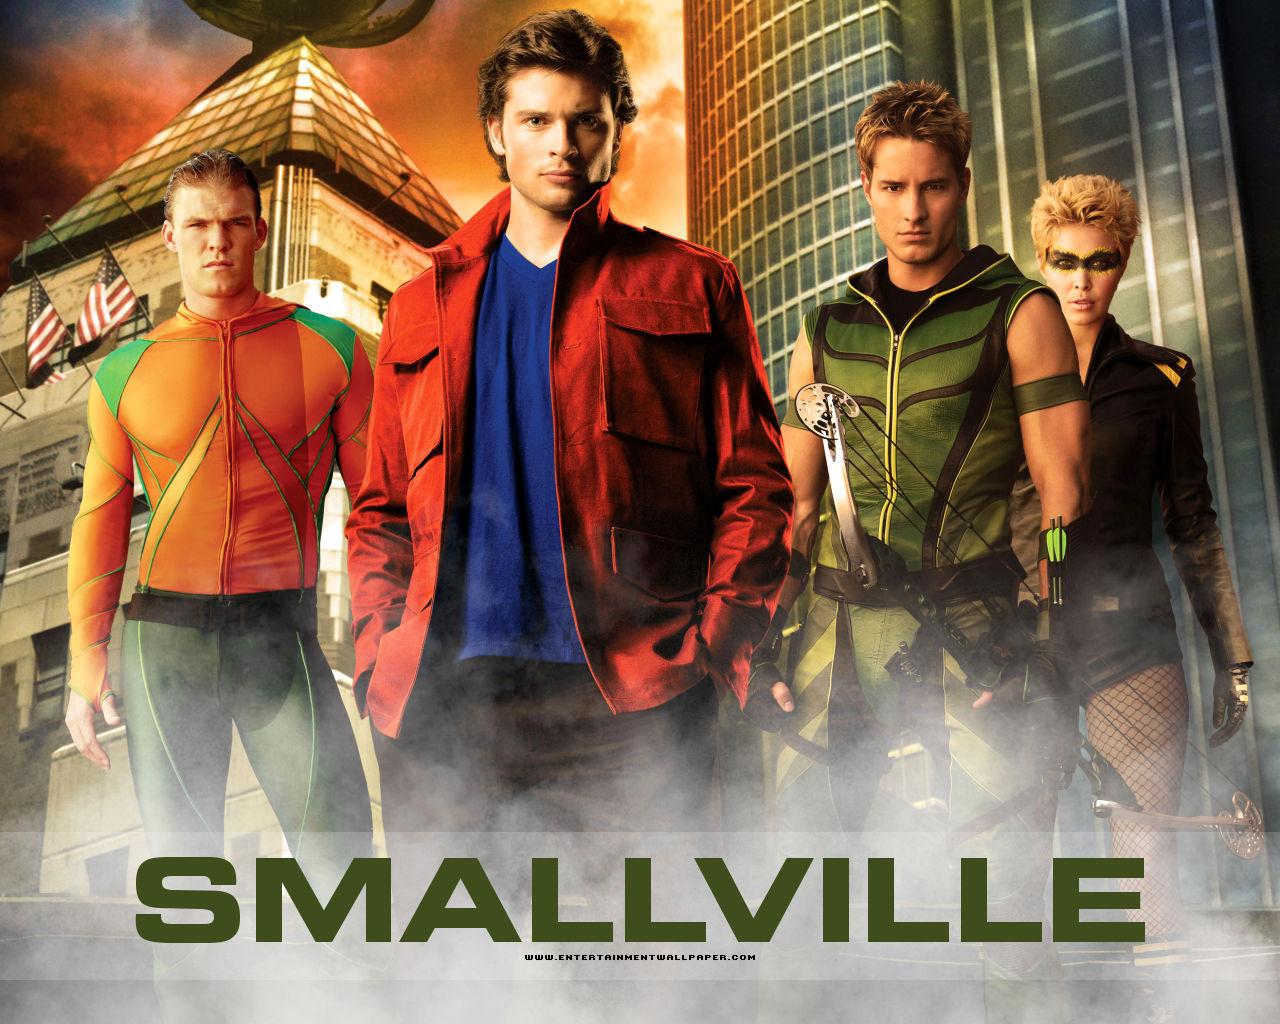 Smallville Desktop Wallpaper, Free!